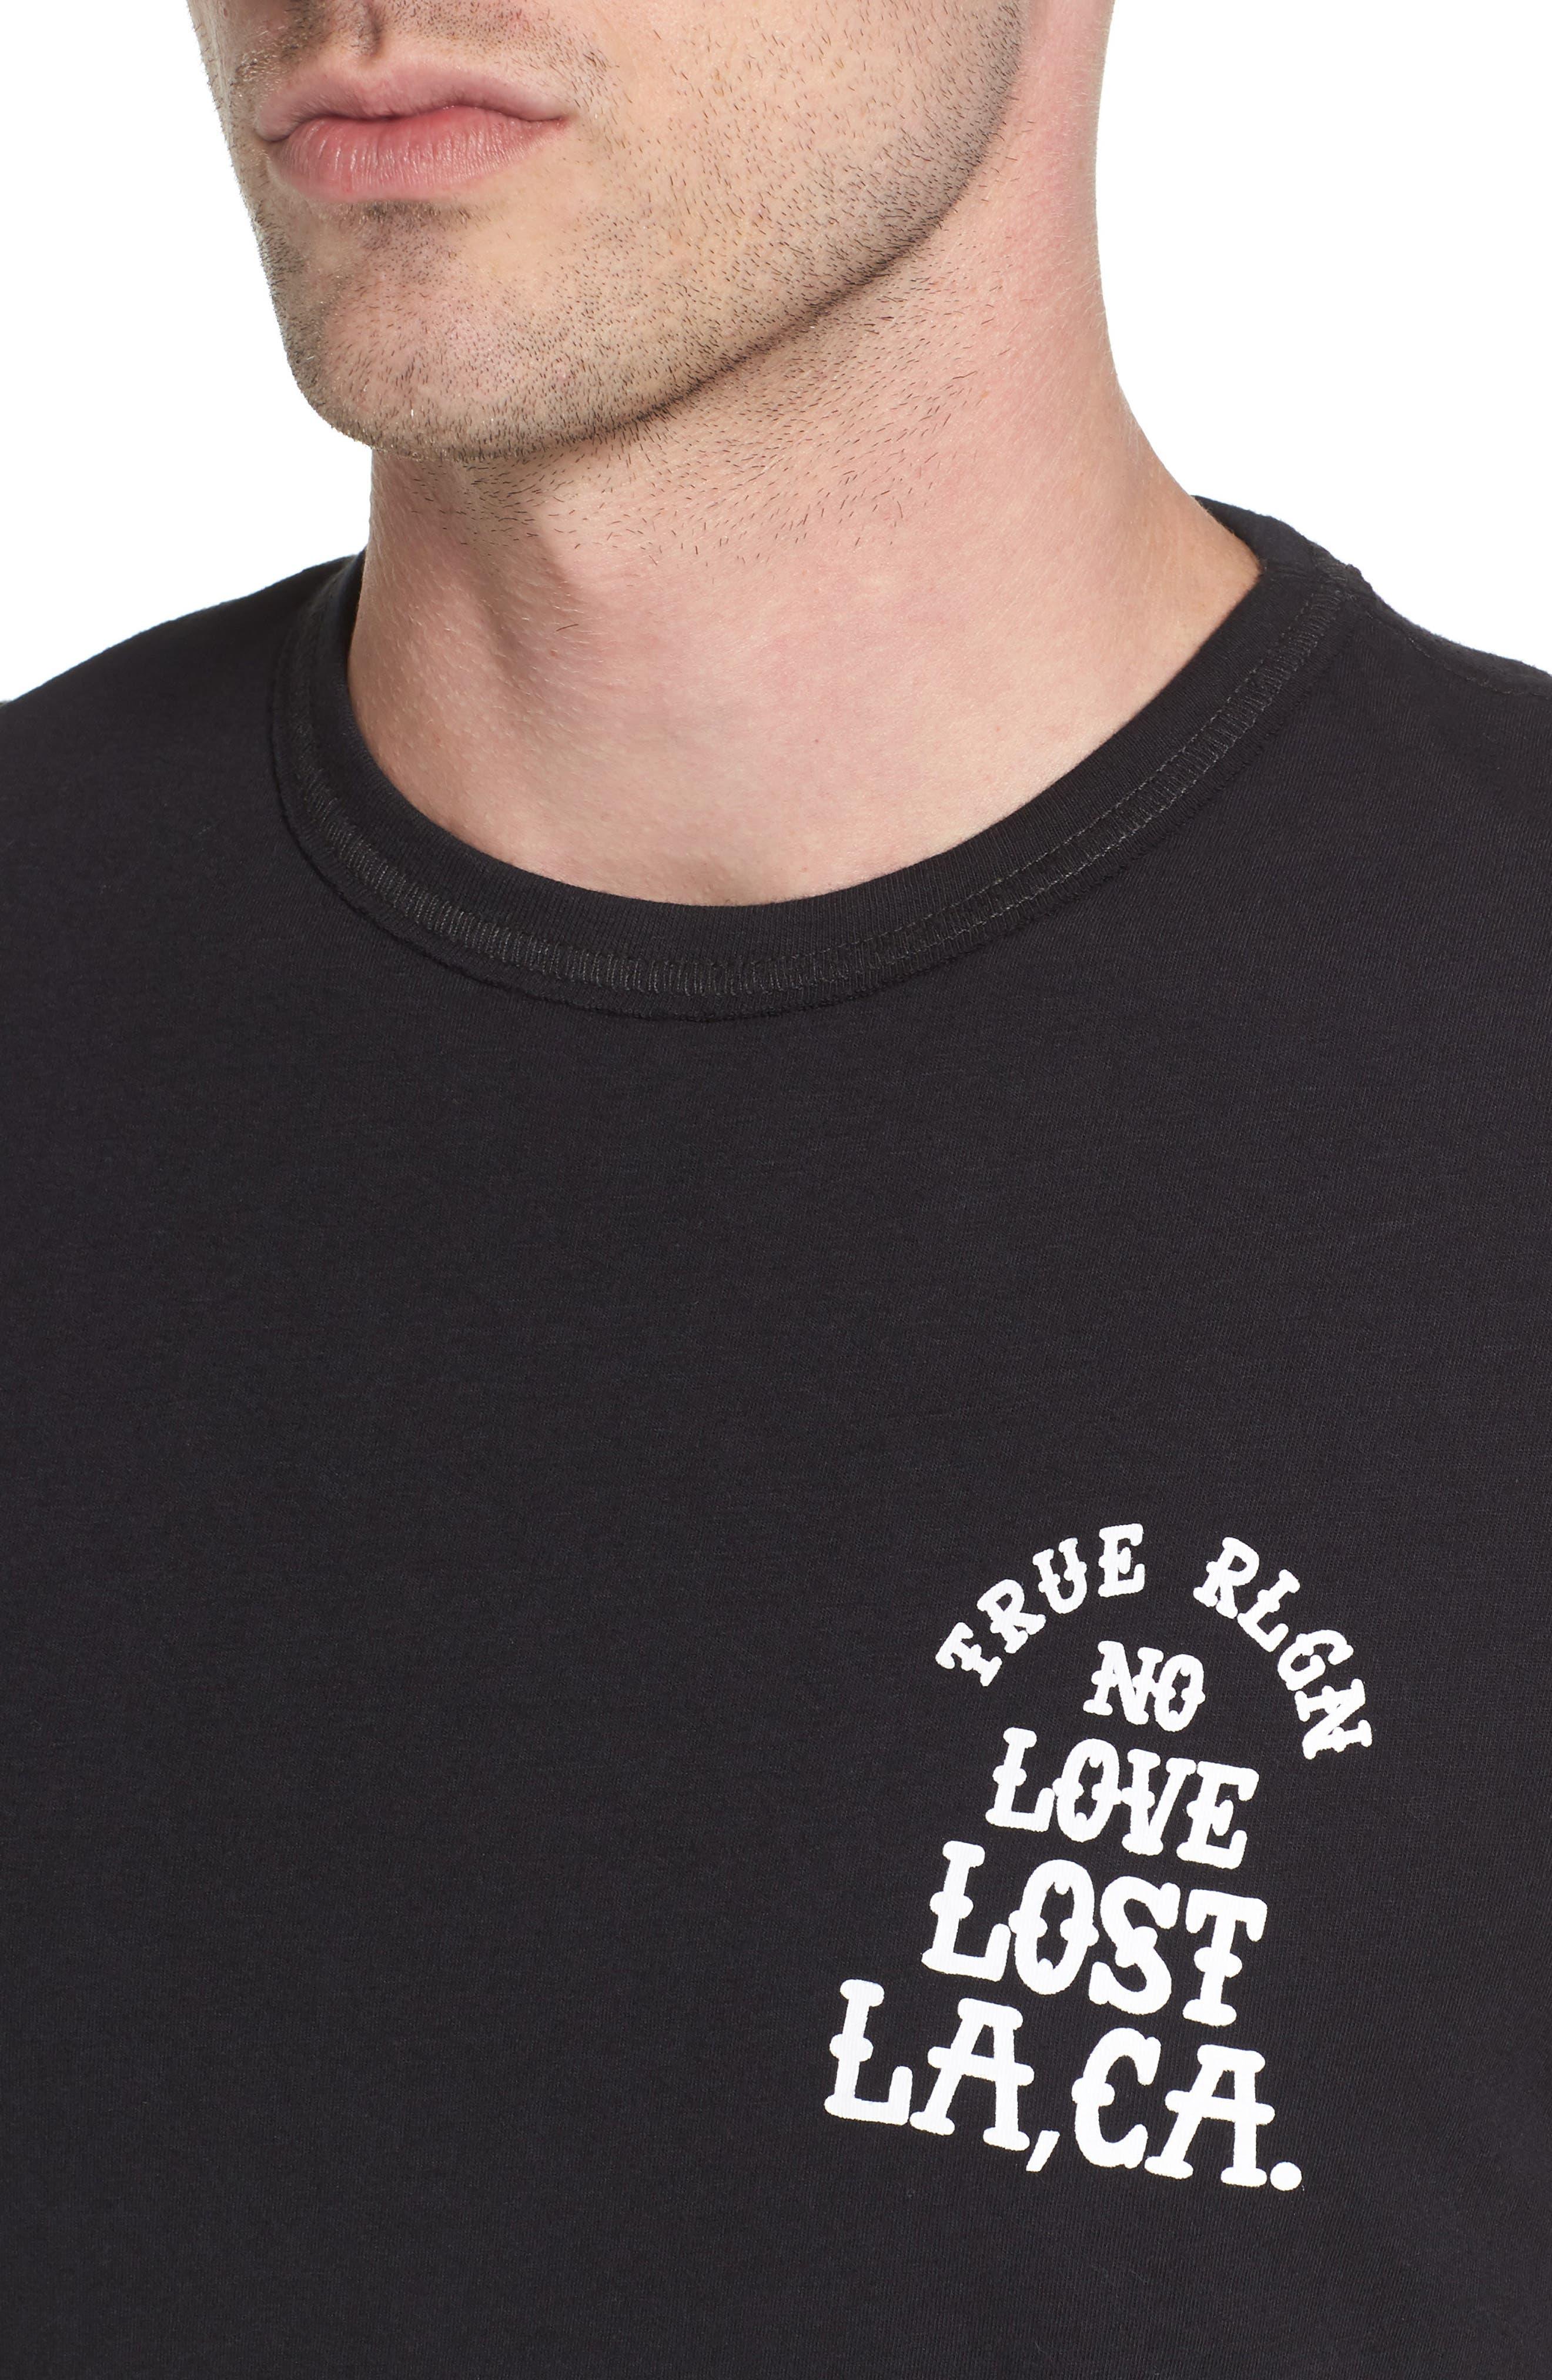 No Love Lost T-Shirt,                             Alternate thumbnail 4, color,                             001